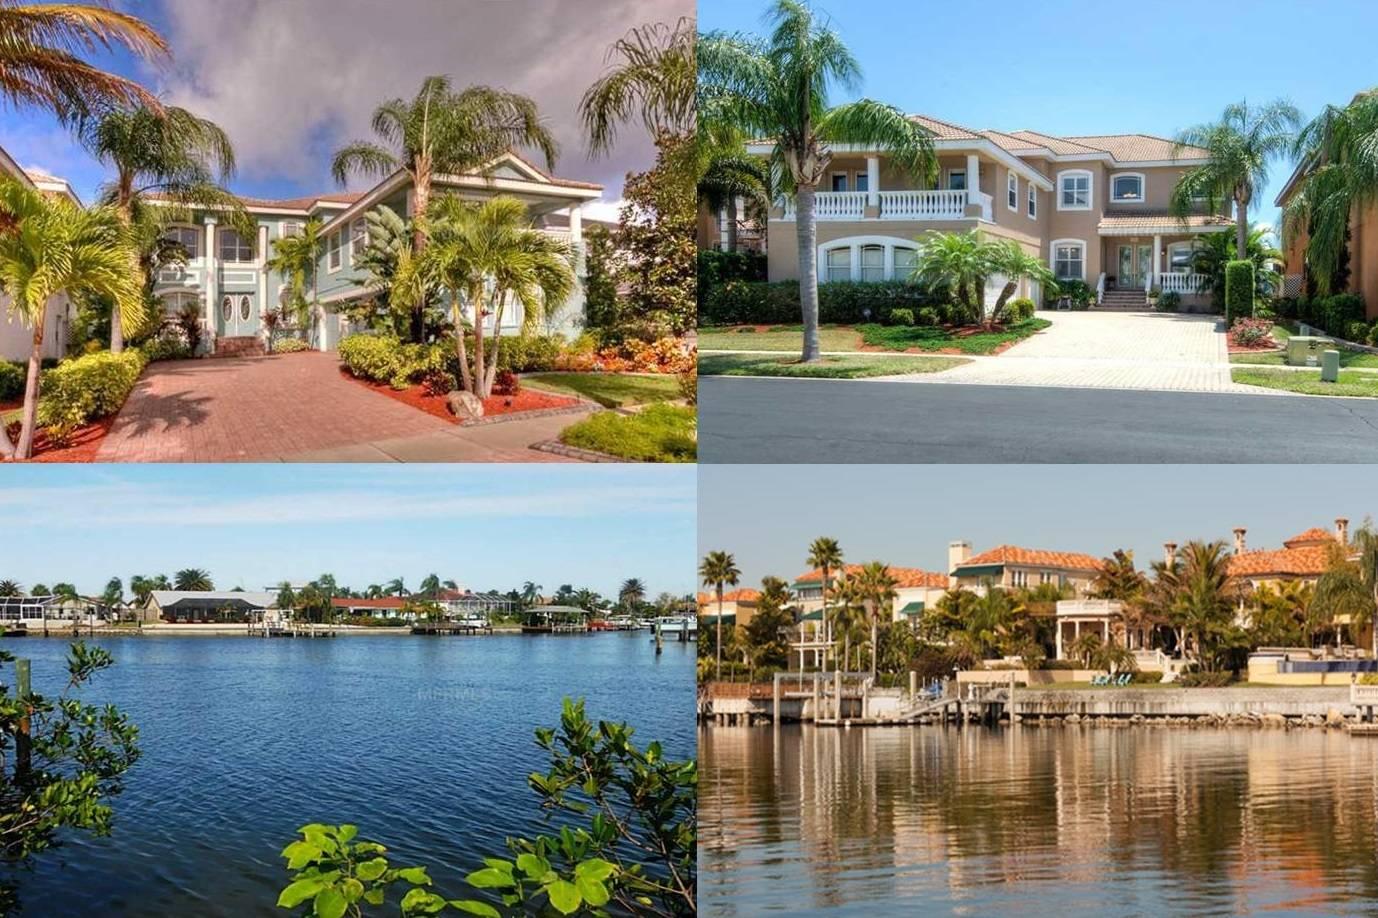 Symphony Isles Homes For Apollo Beach Florida